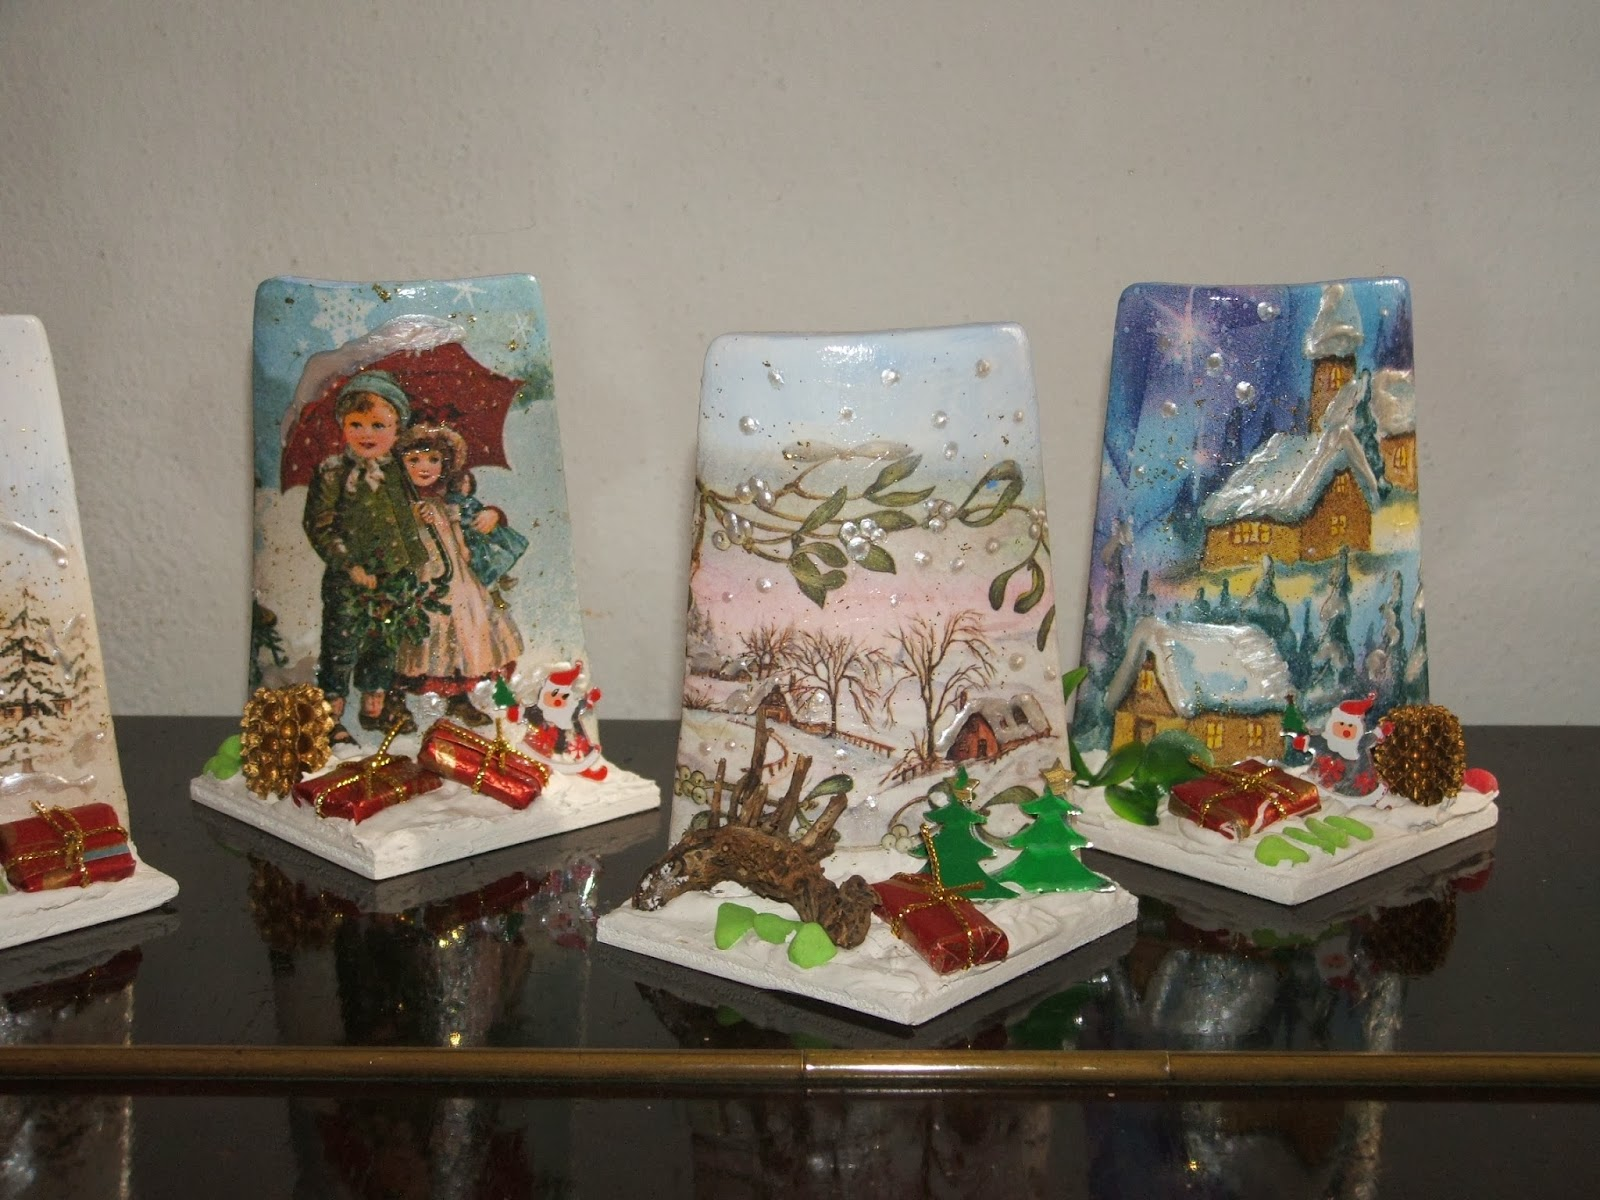 Tegole decorate con decoupage igufidienza - Tegole decorate ...